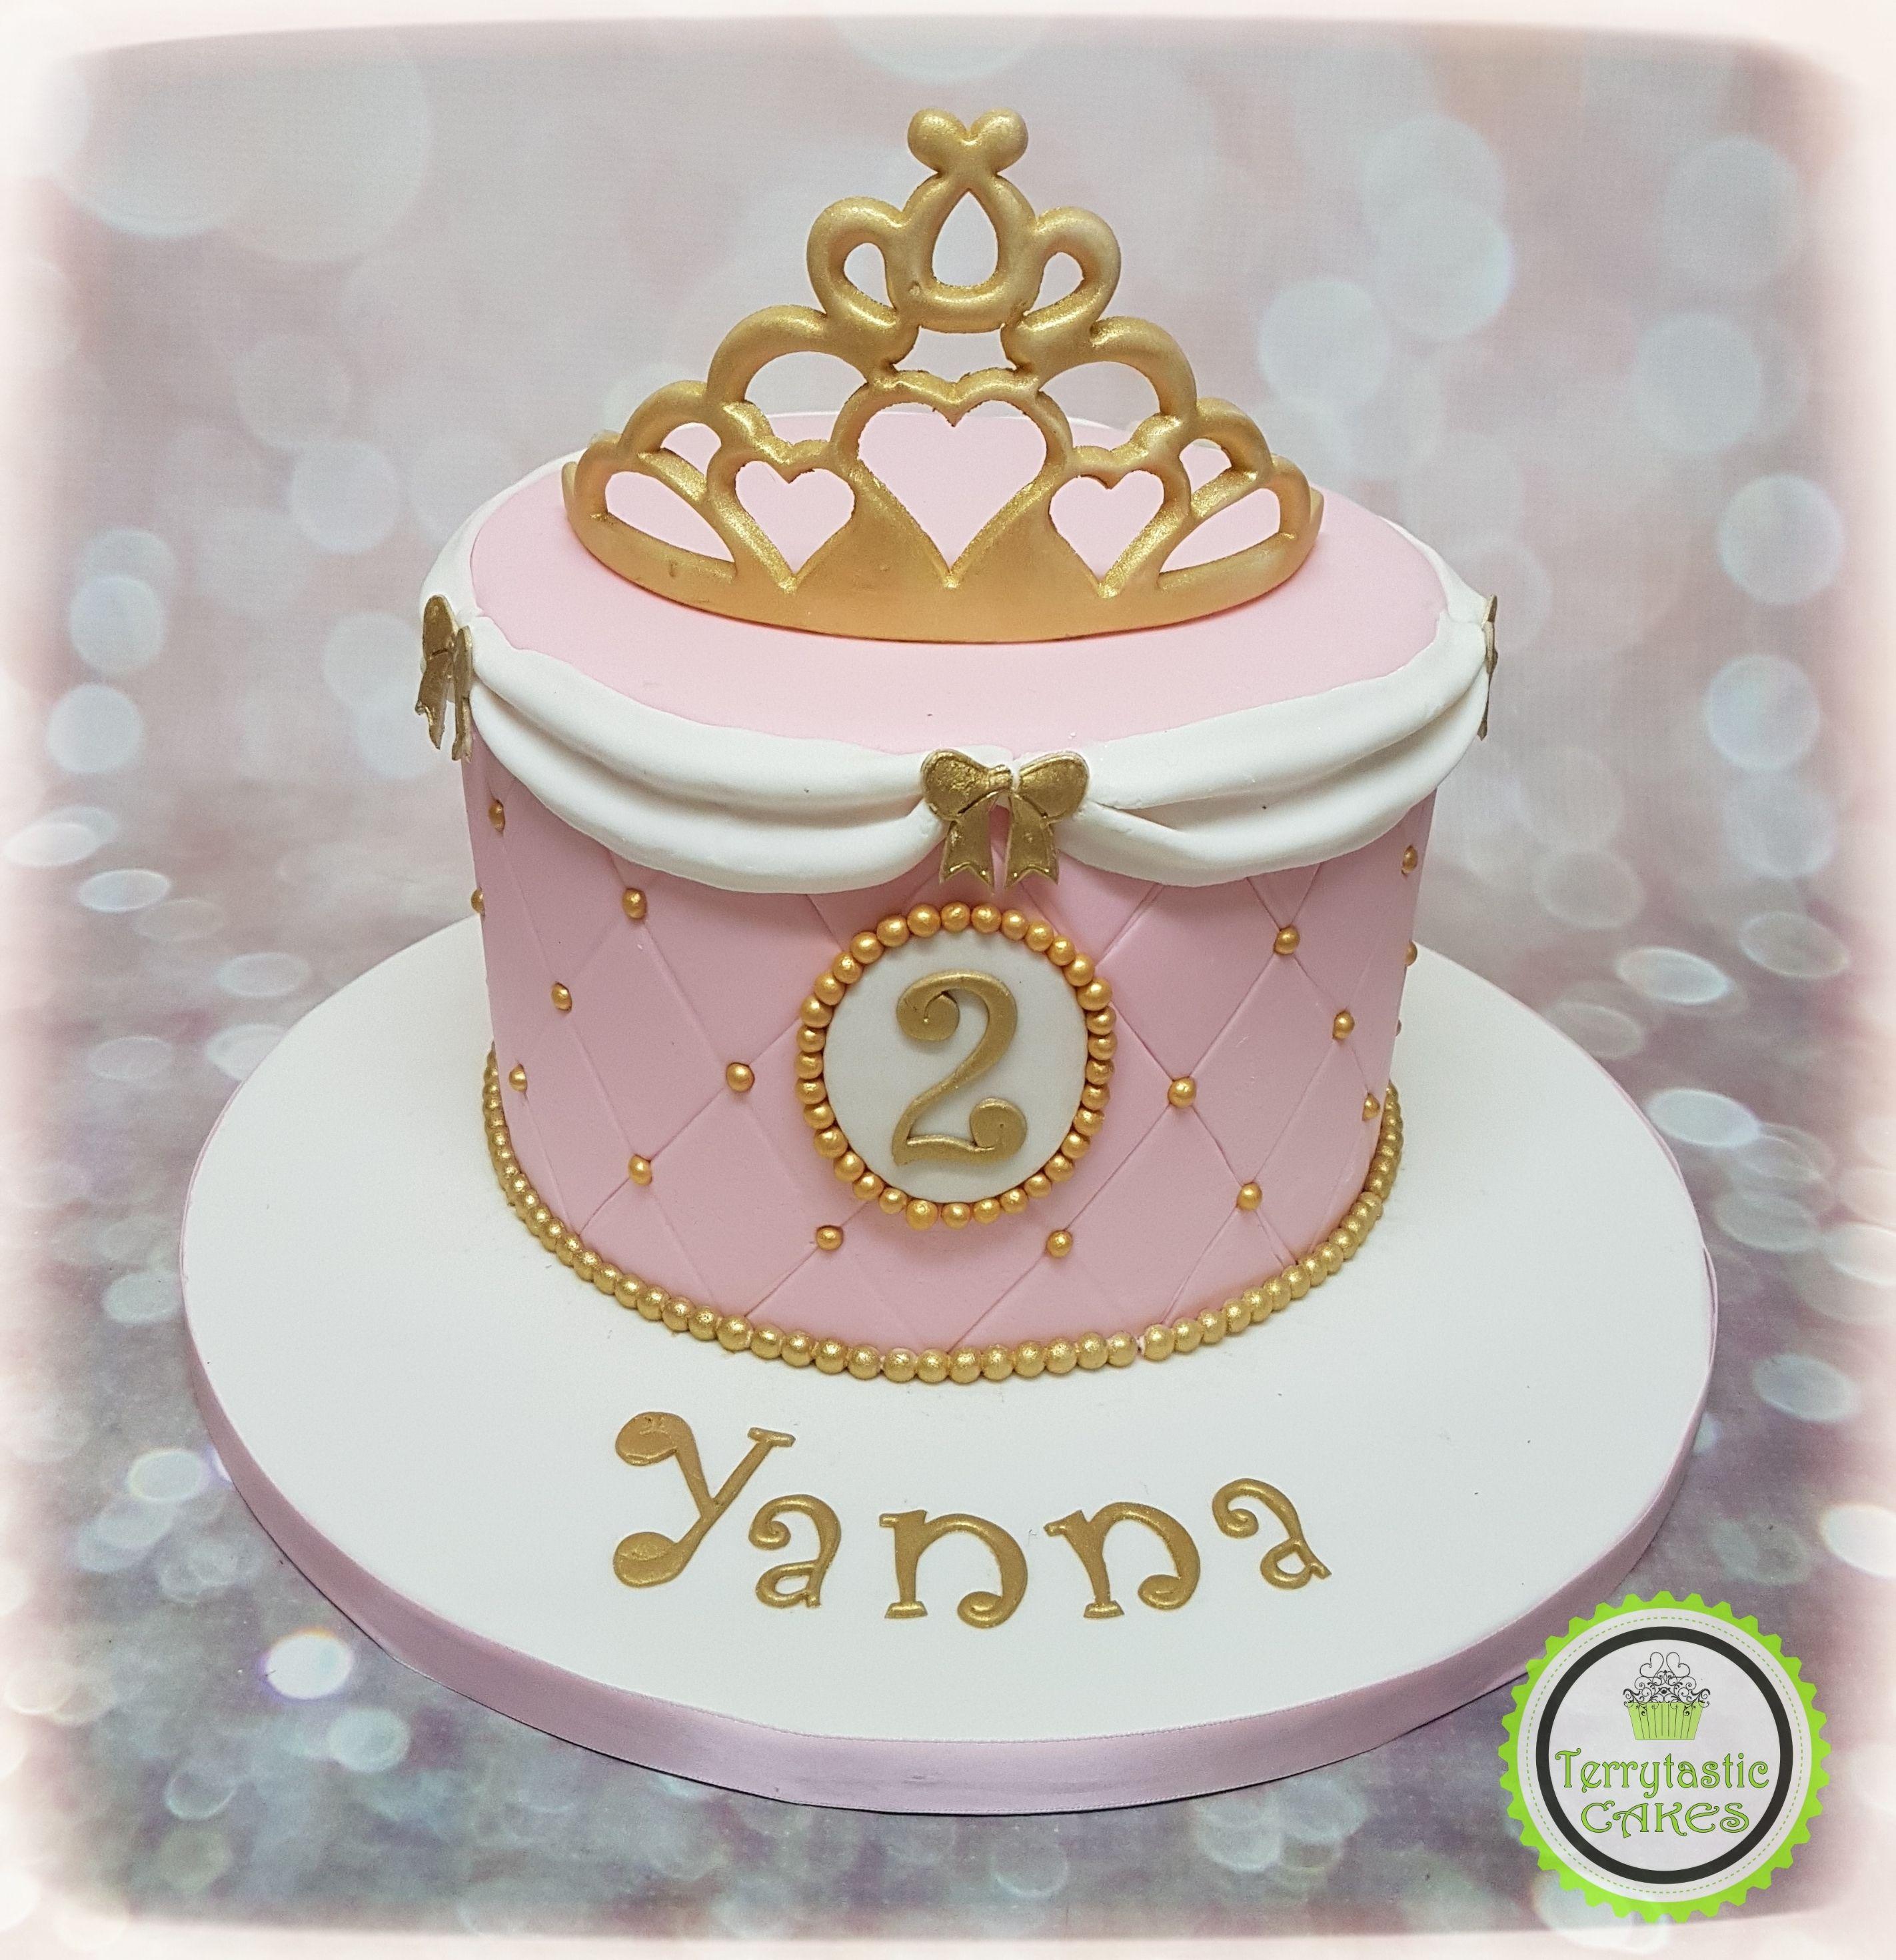 Awe Inspiring 27 Amazing Image Of Crown Birthday Cake Crown Birthday Cake Funny Birthday Cards Online Alyptdamsfinfo